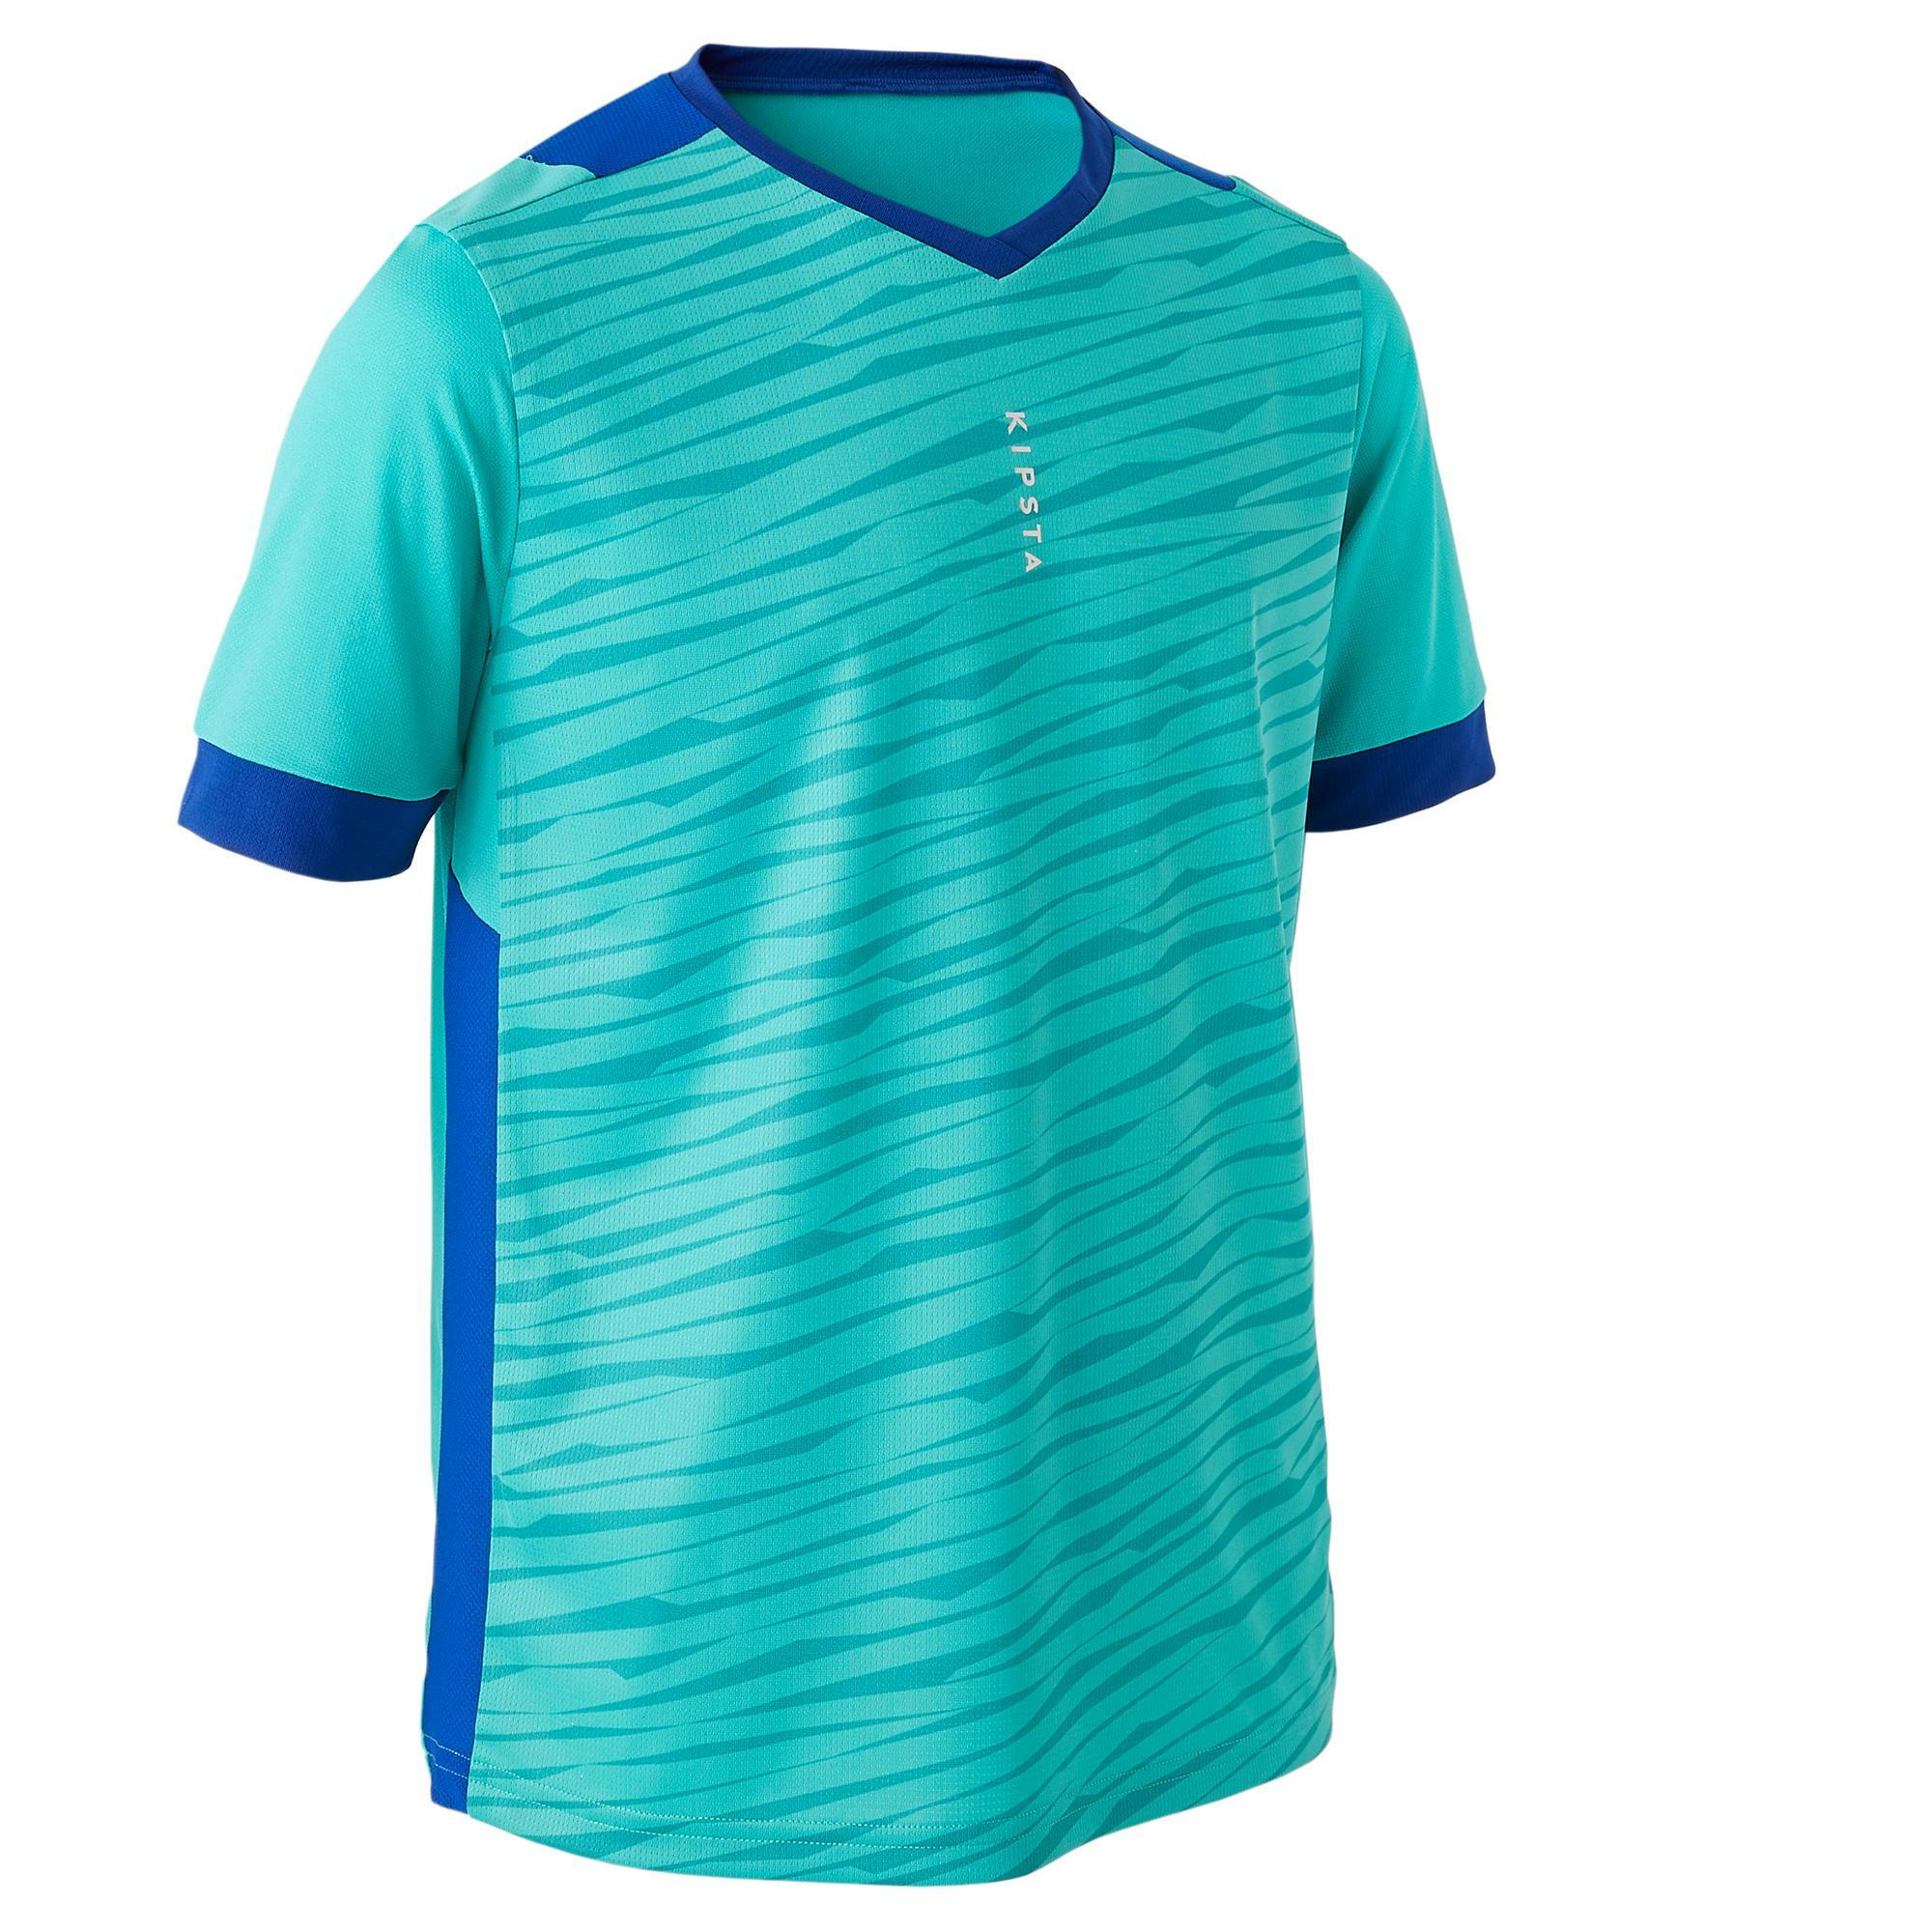 Kipsta Voetbalshirt kind F500 turquoise/blauw